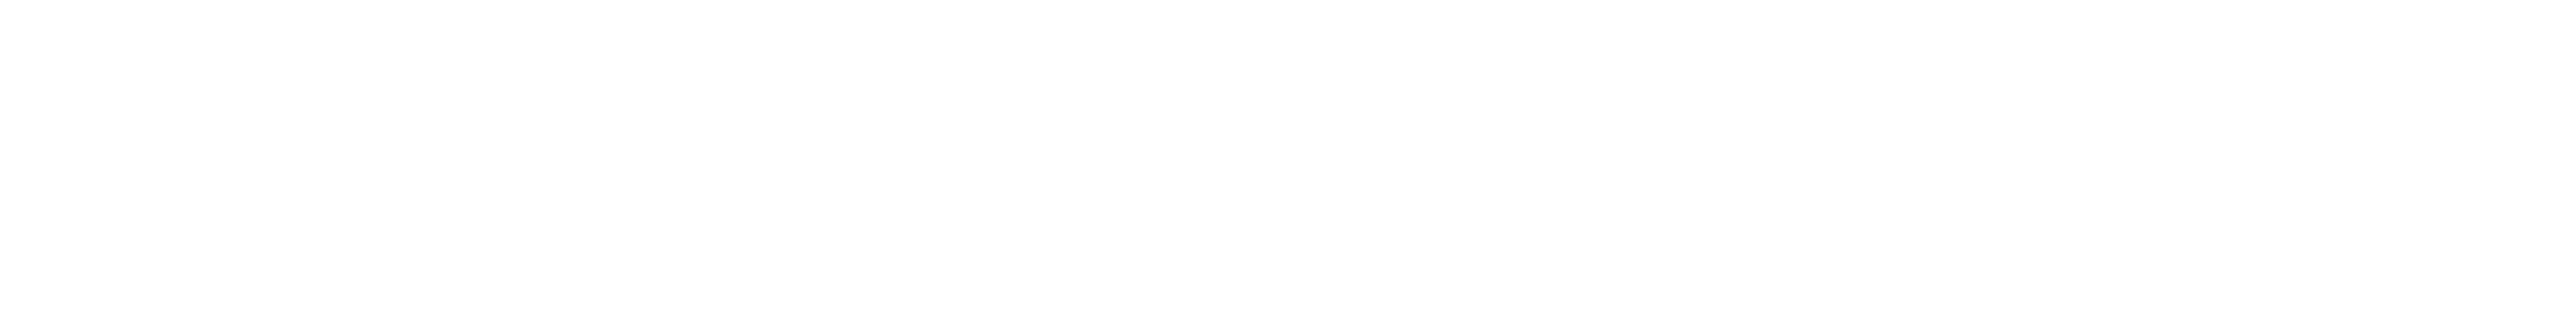 western-union-neg